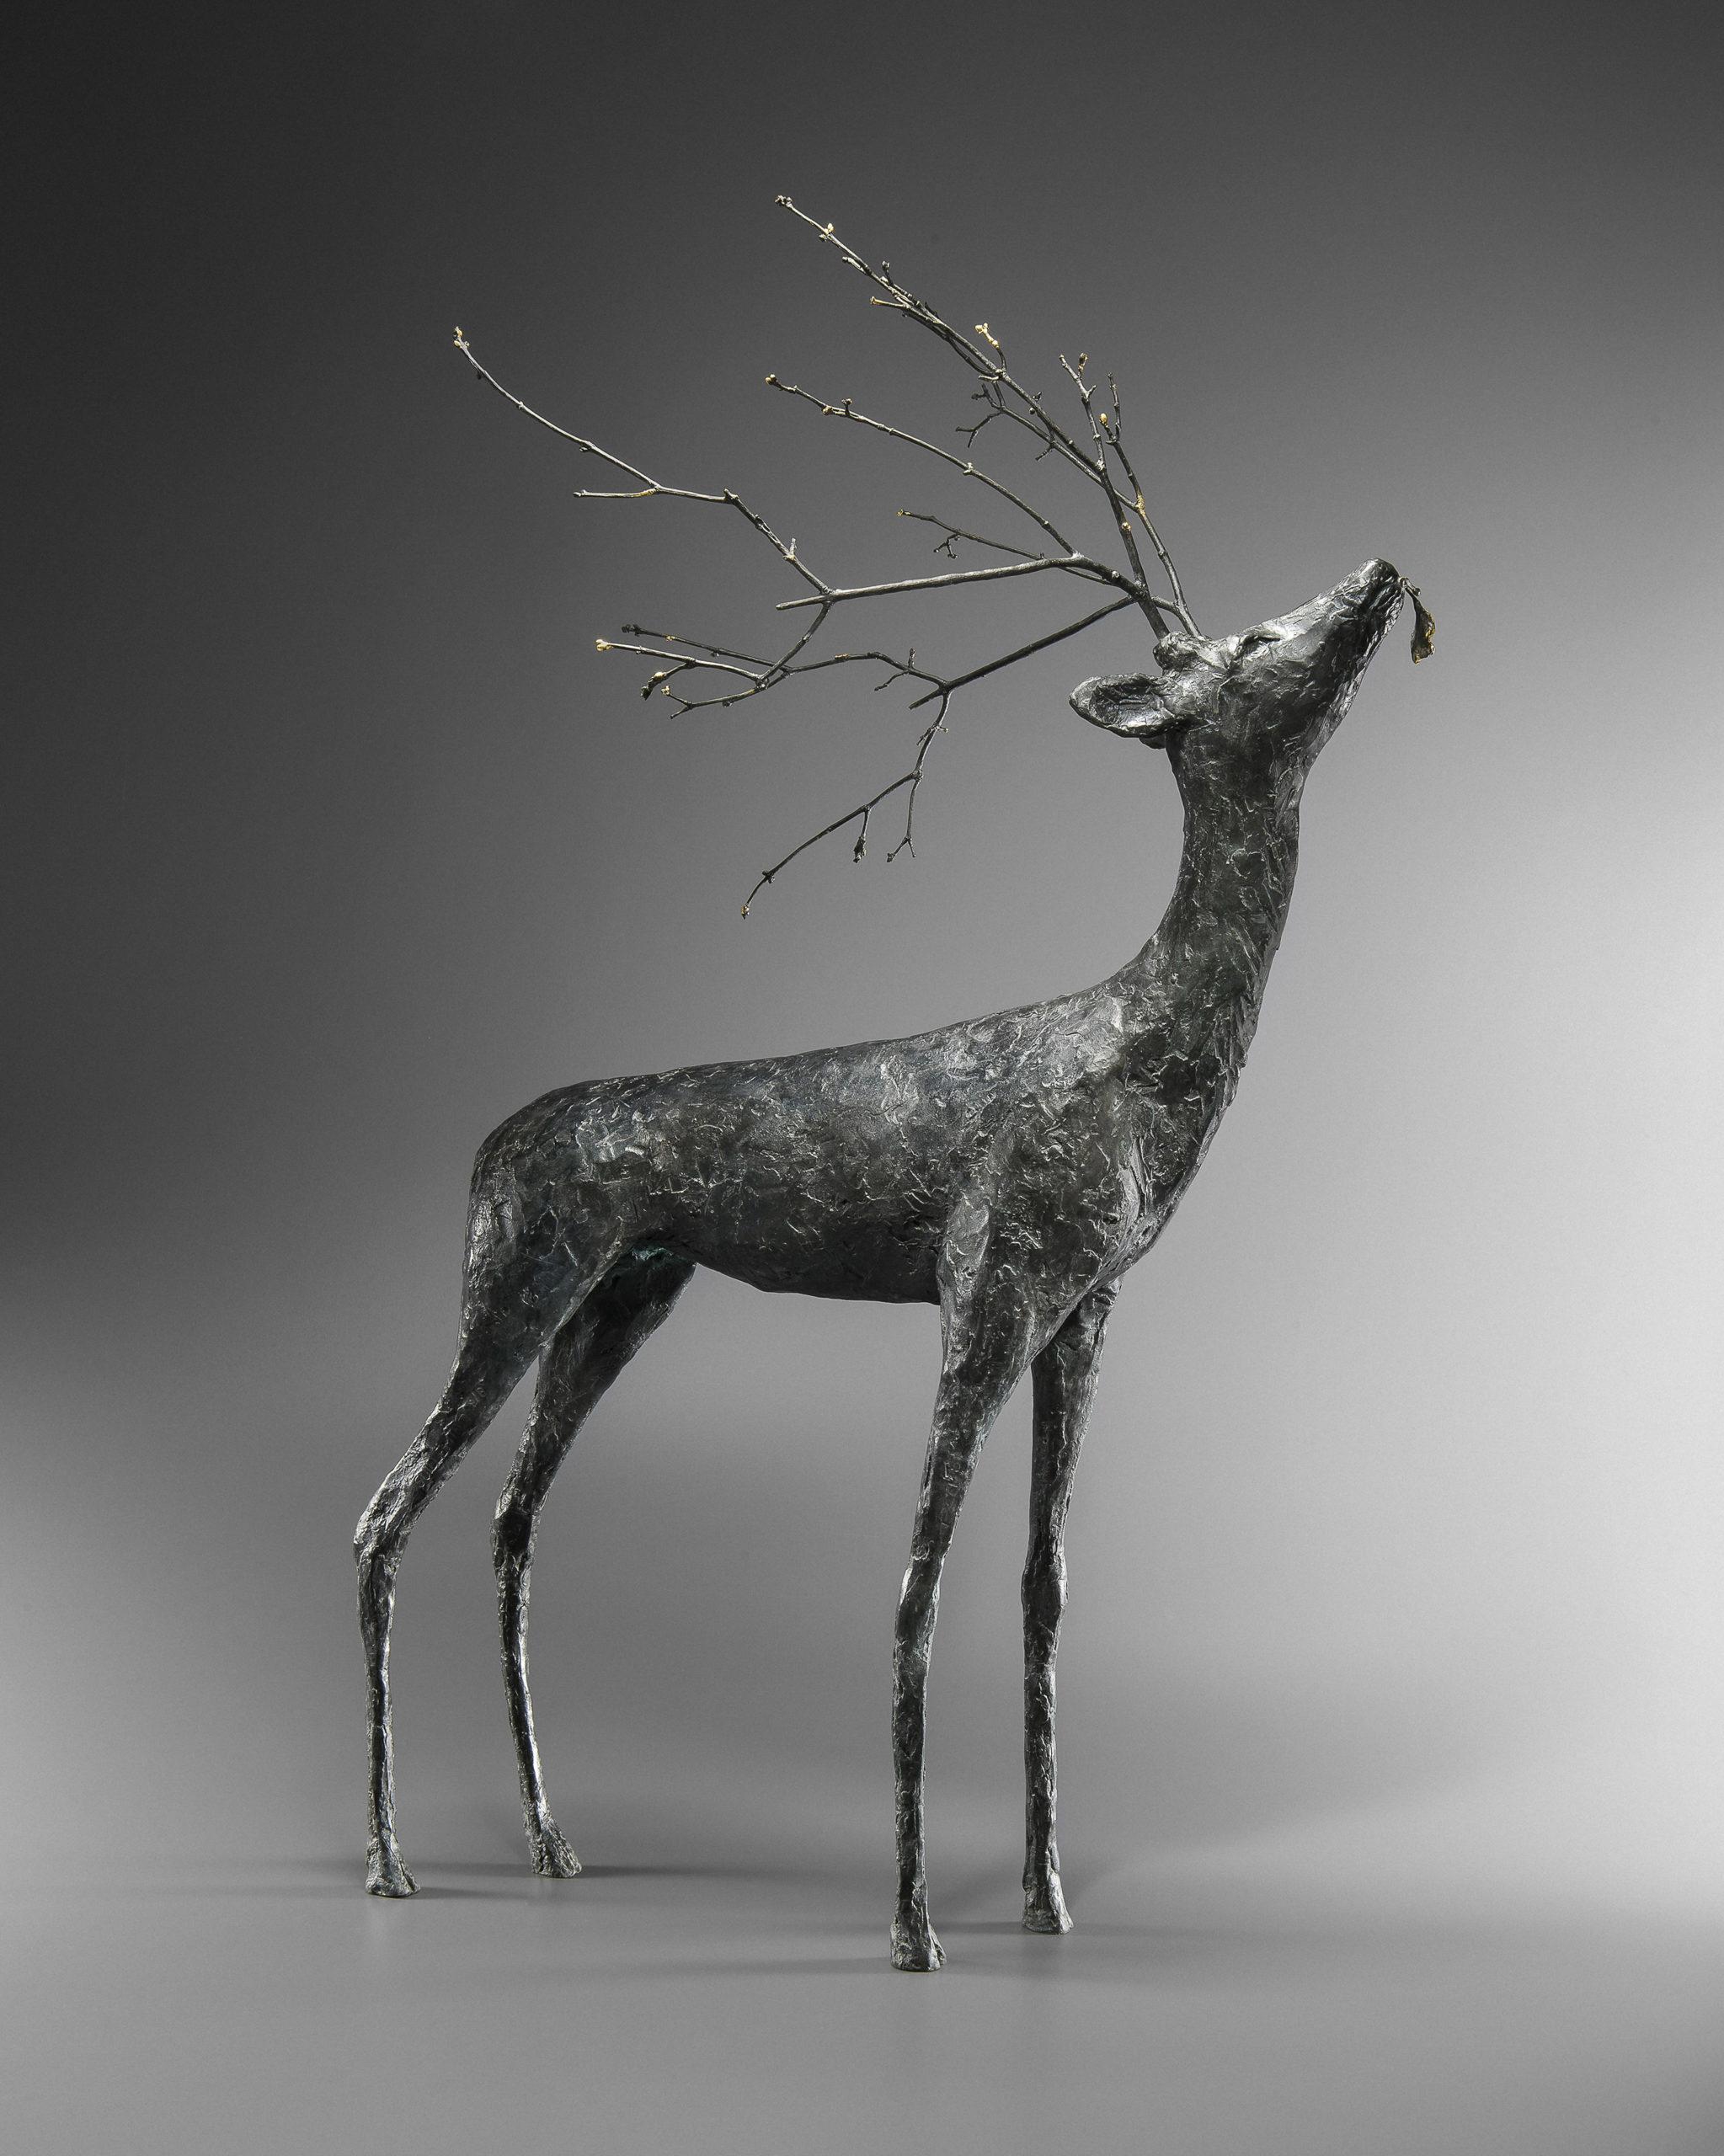 2-Guillemin-Jeune-Cerf-galerie-bettina-art-contemporain-paris